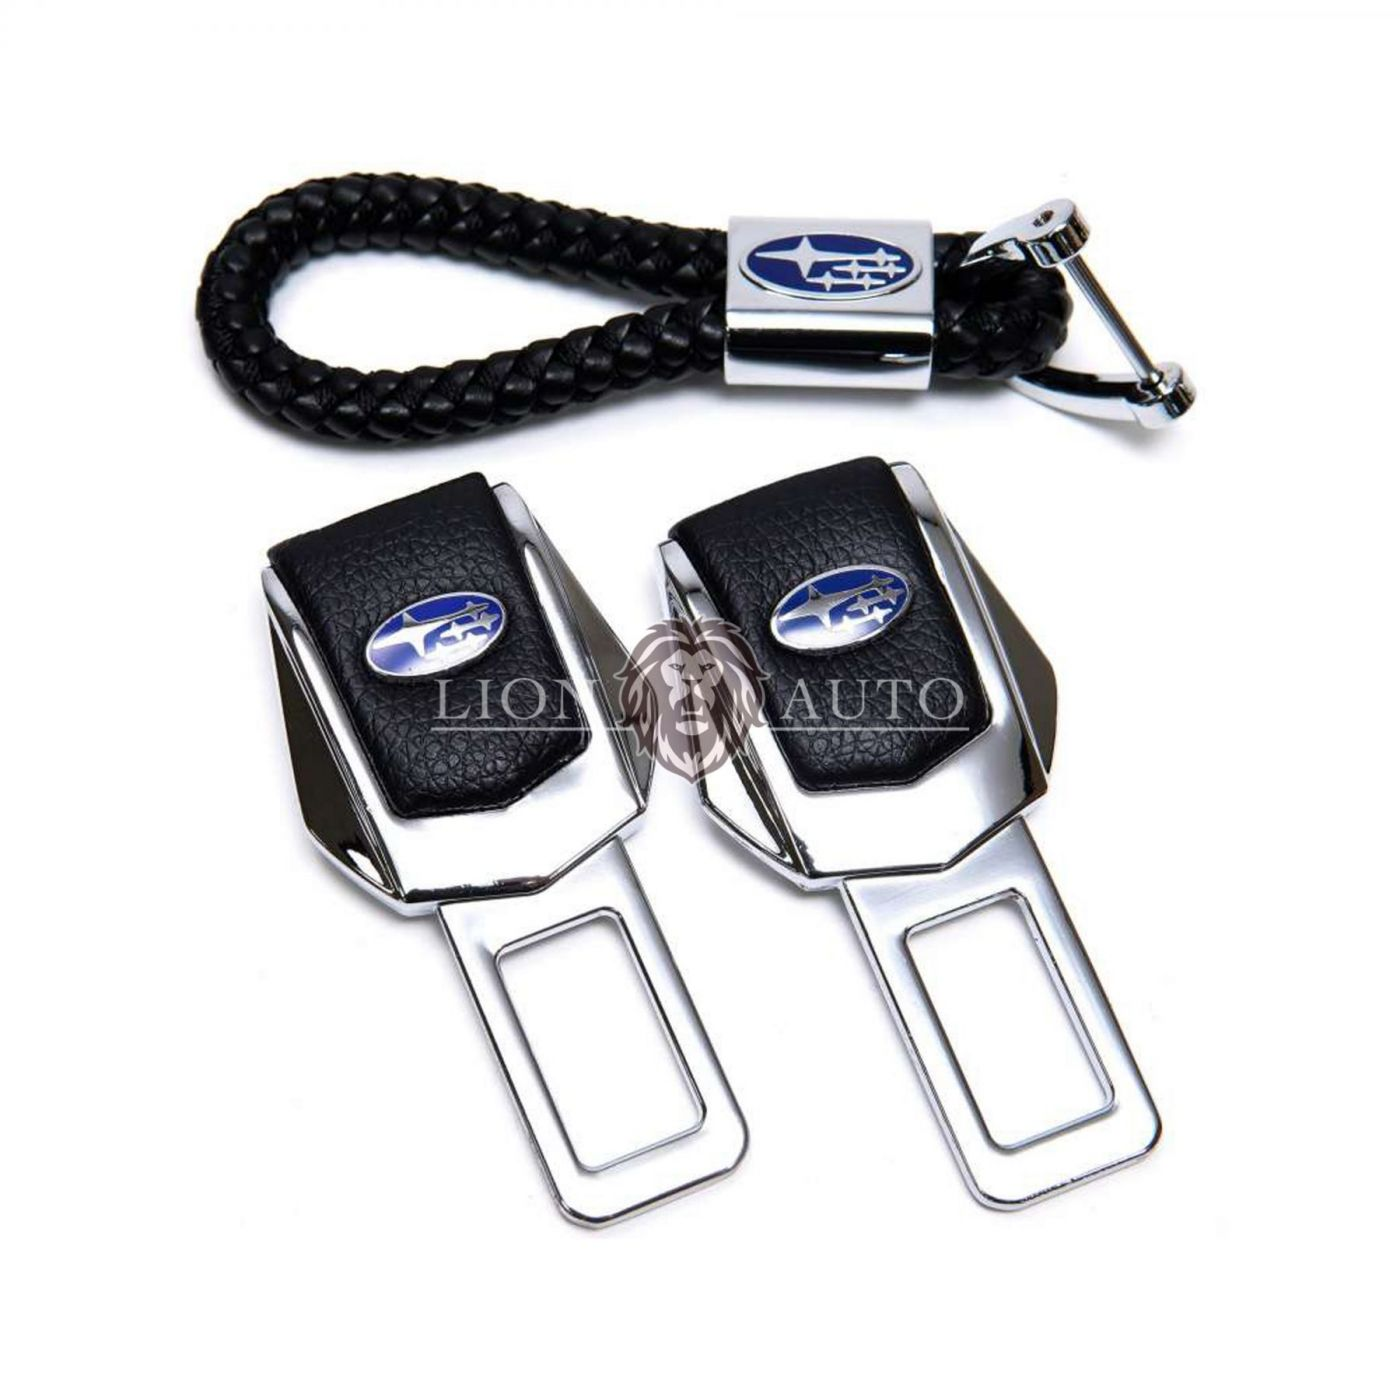 Заглушки ремня безопасности на Subaru (набор)